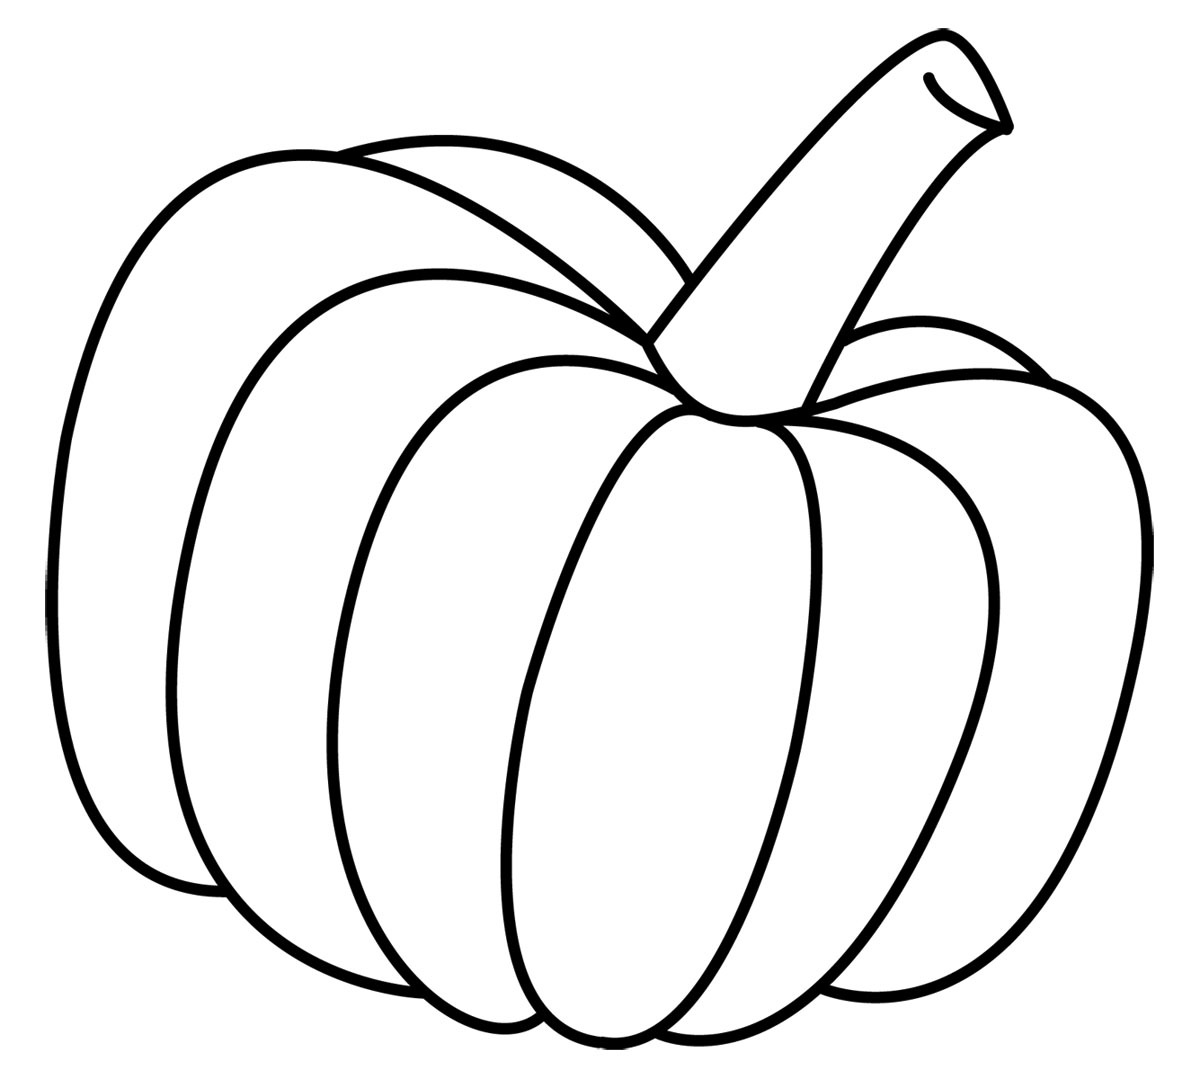 Clip Art Pumpkin Clipart Black And White cute pumpkin black and white clipart kid 2014 clipartpanda com about terms